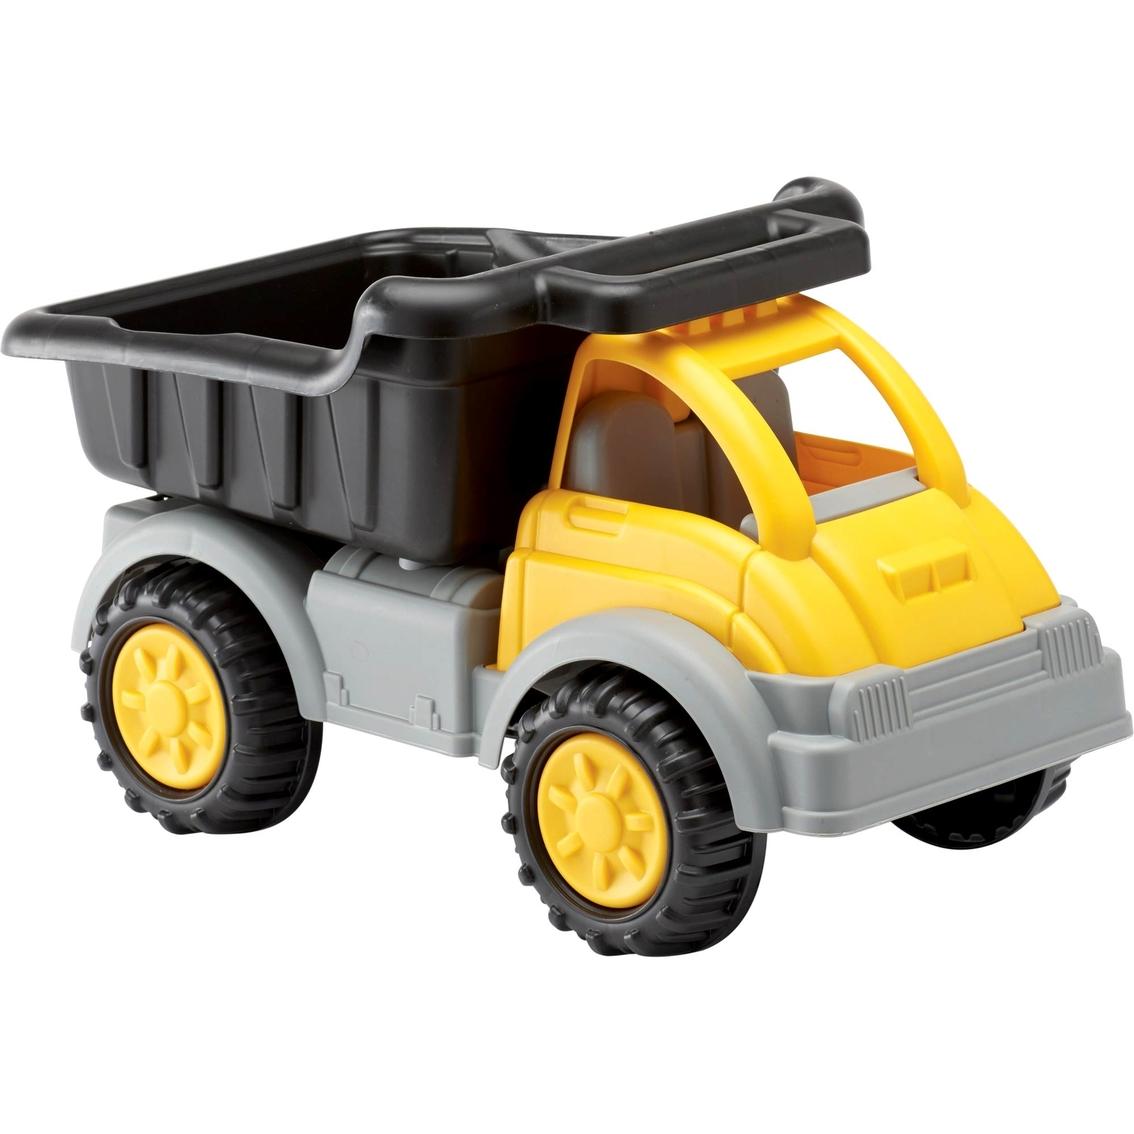 American Plastics Gigantic Dump Truck Cars Trucks Planes Baby